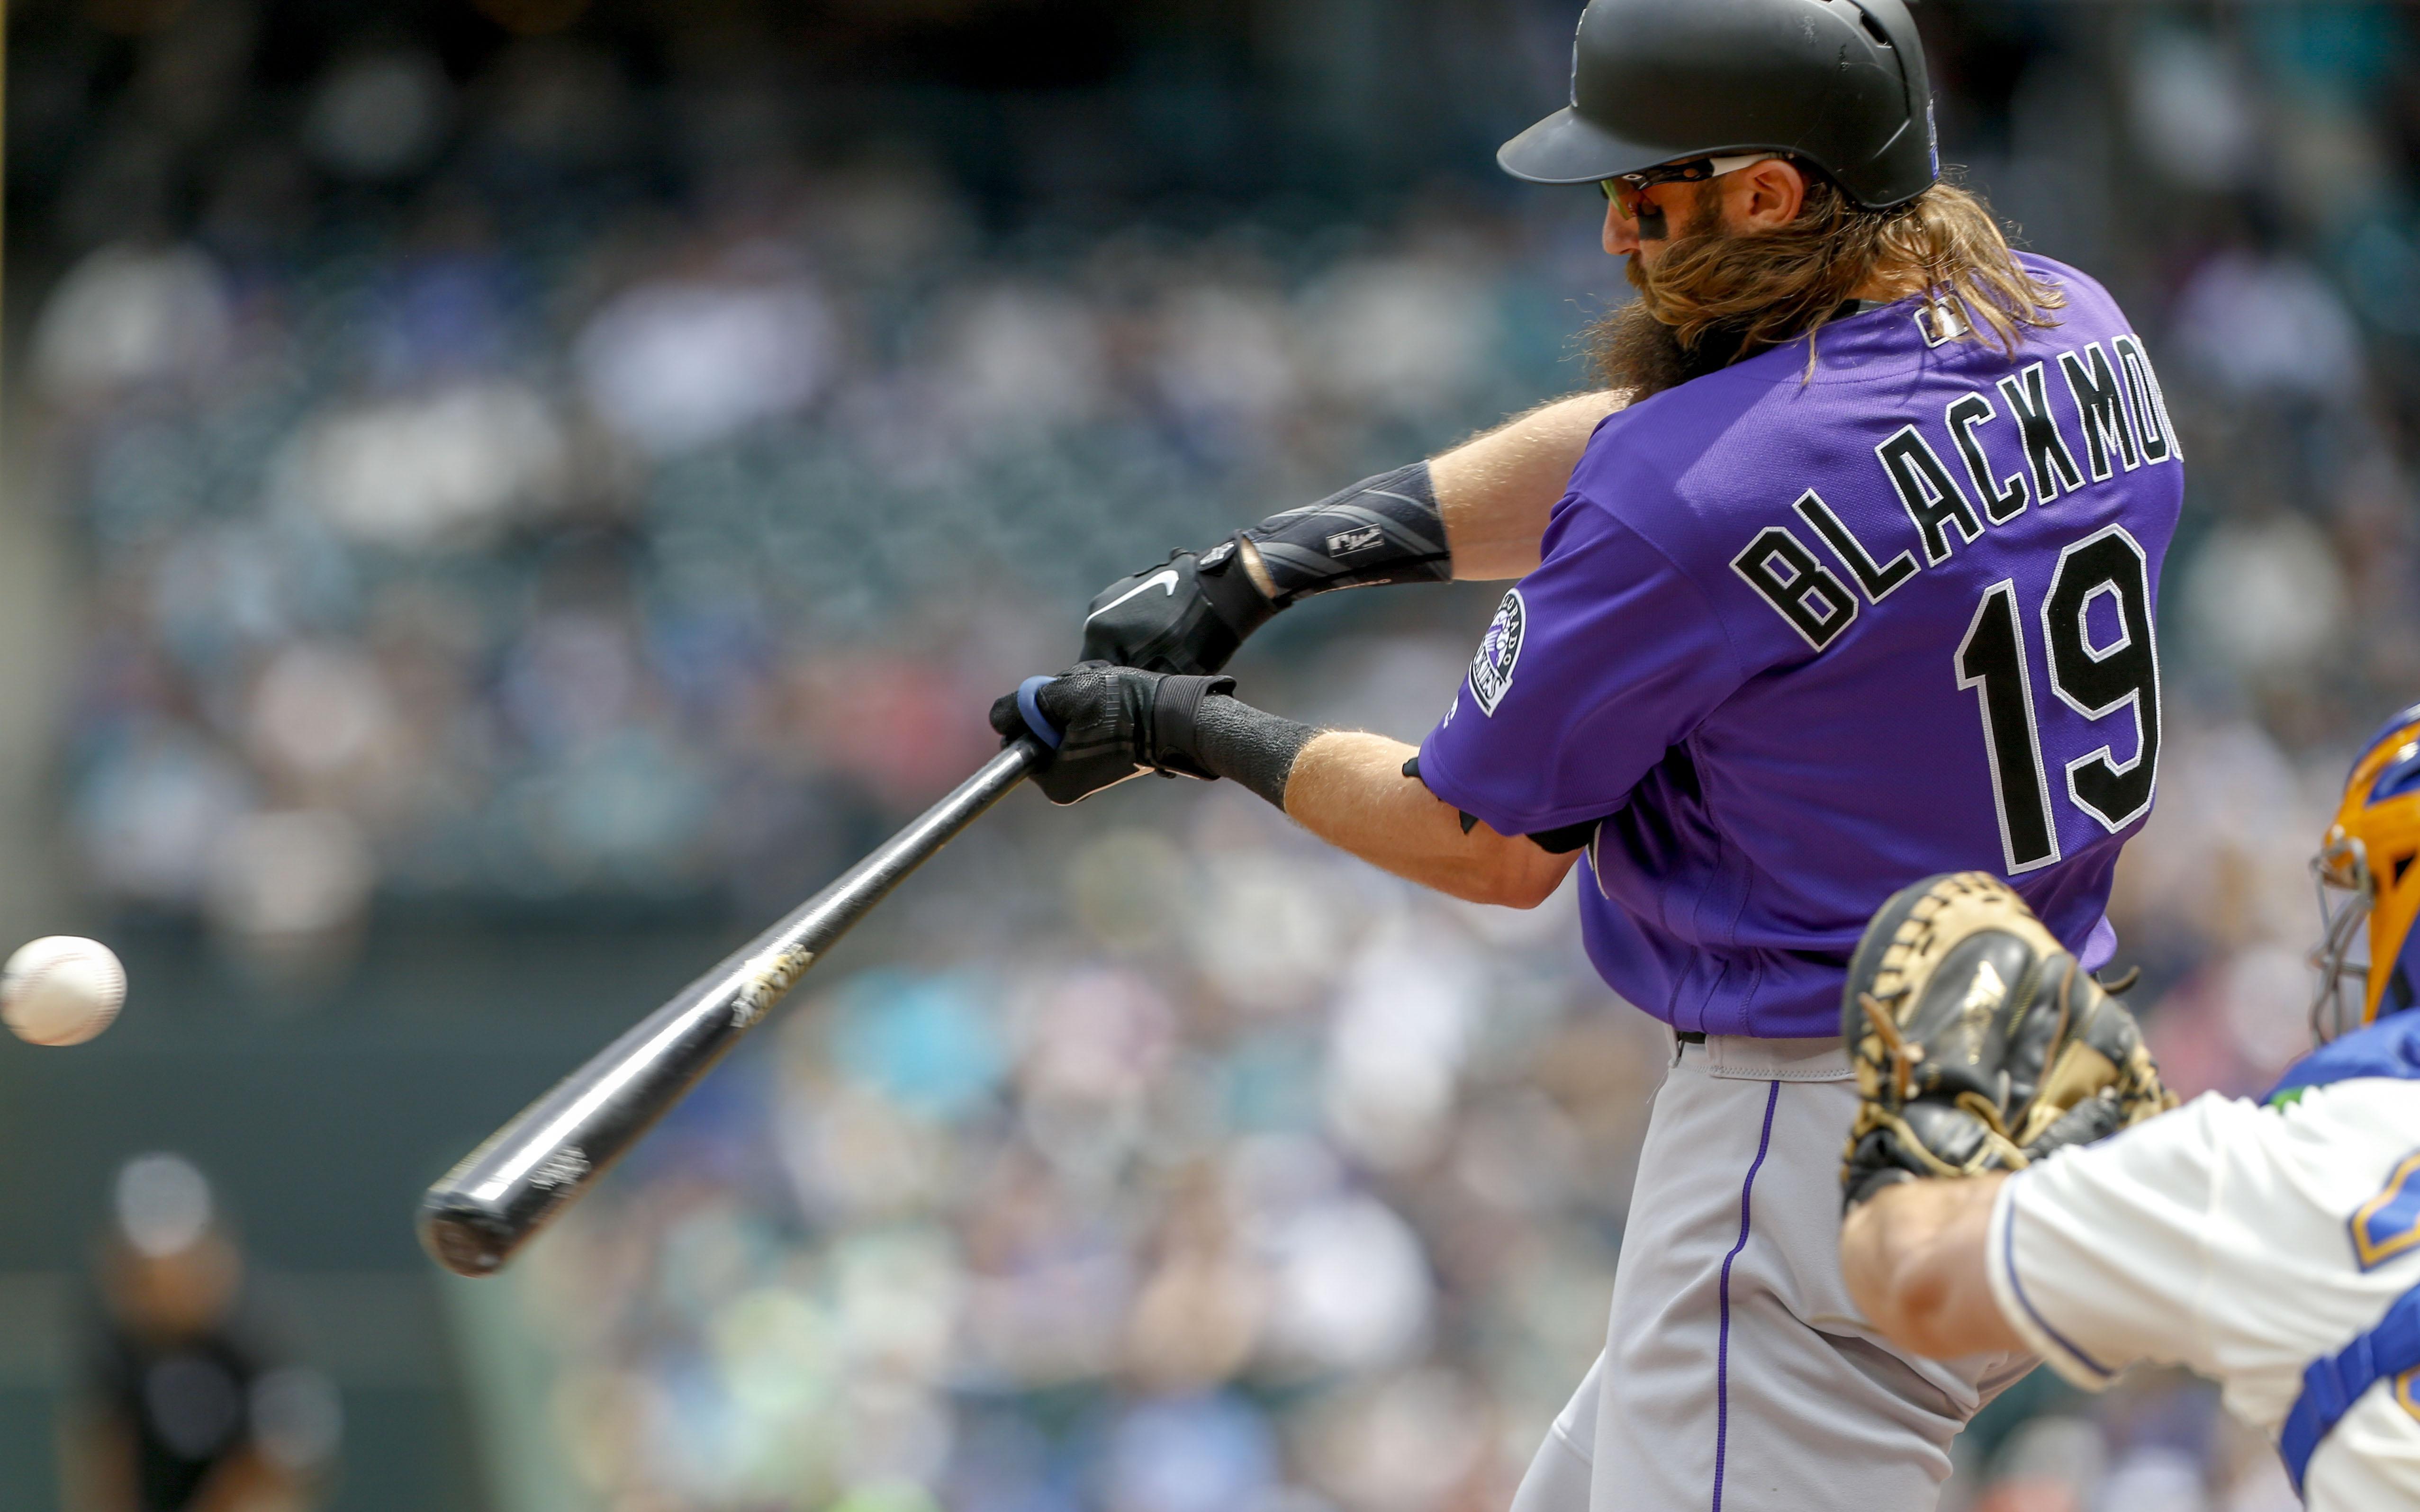 Charlie Blackmon hitting his solo home run Sunday. Credit: Jennifer Buchanan, USA TODAY Sports.